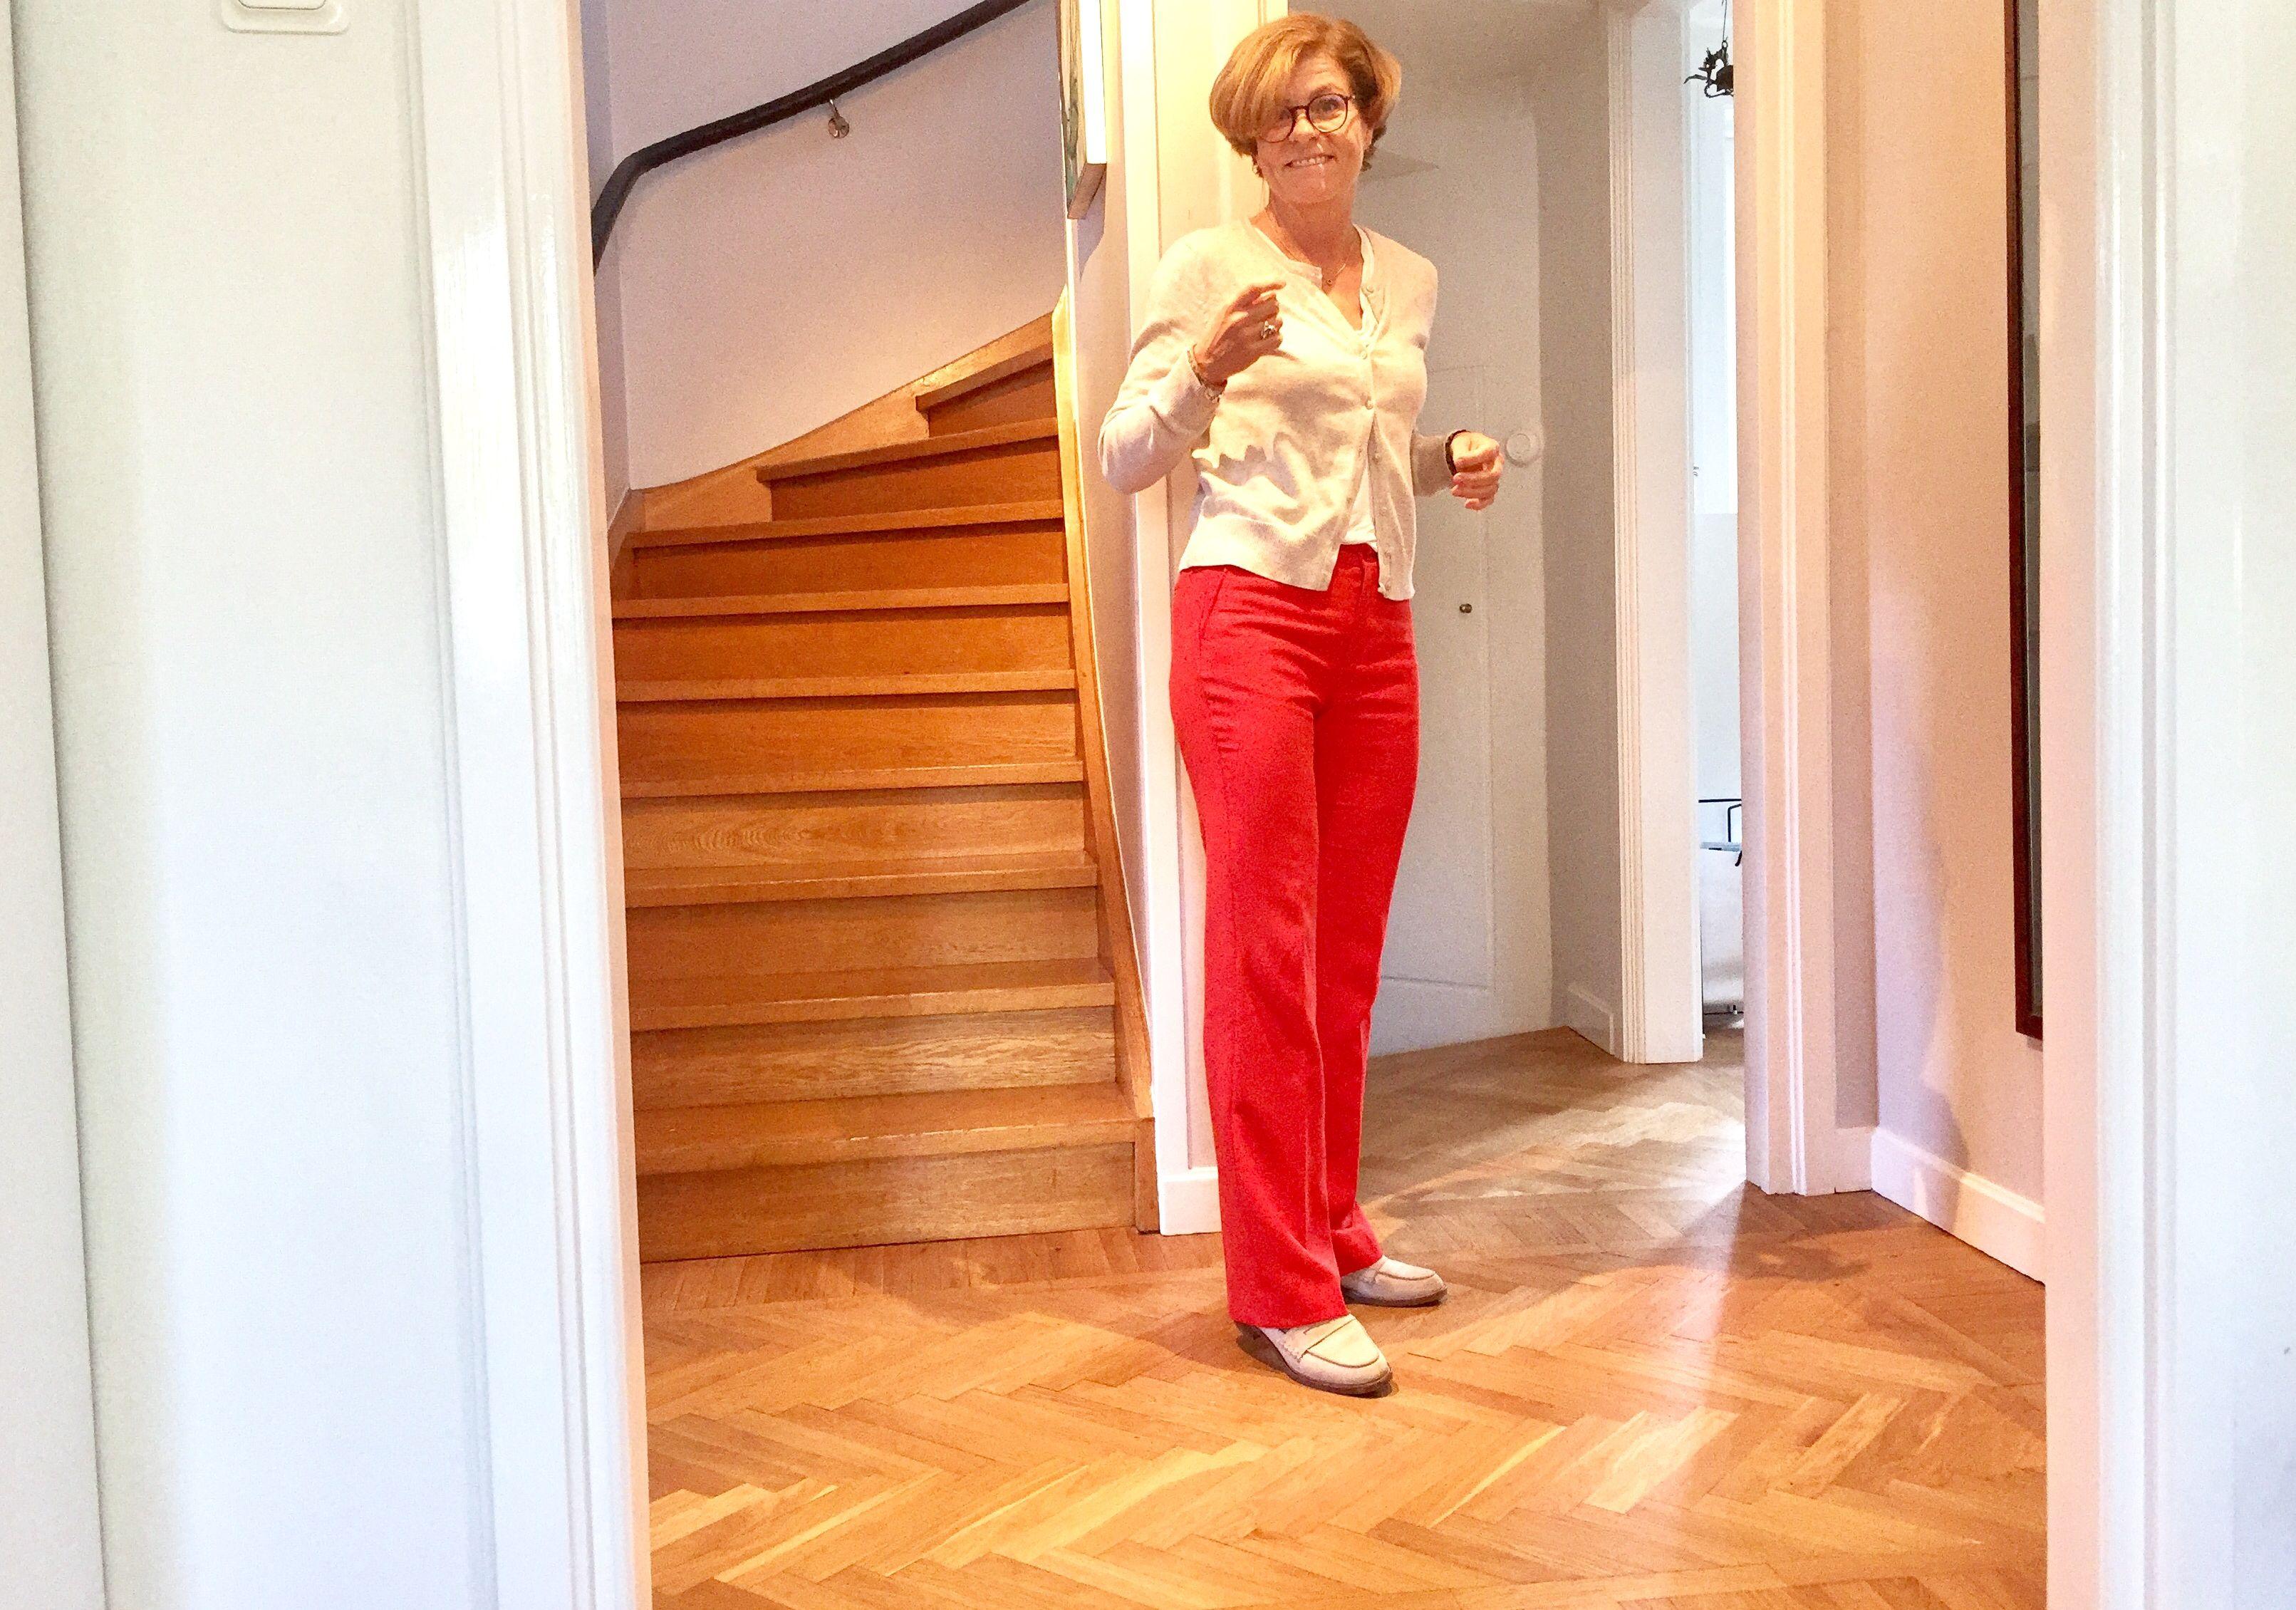 Friday Red Fling #whydontyou